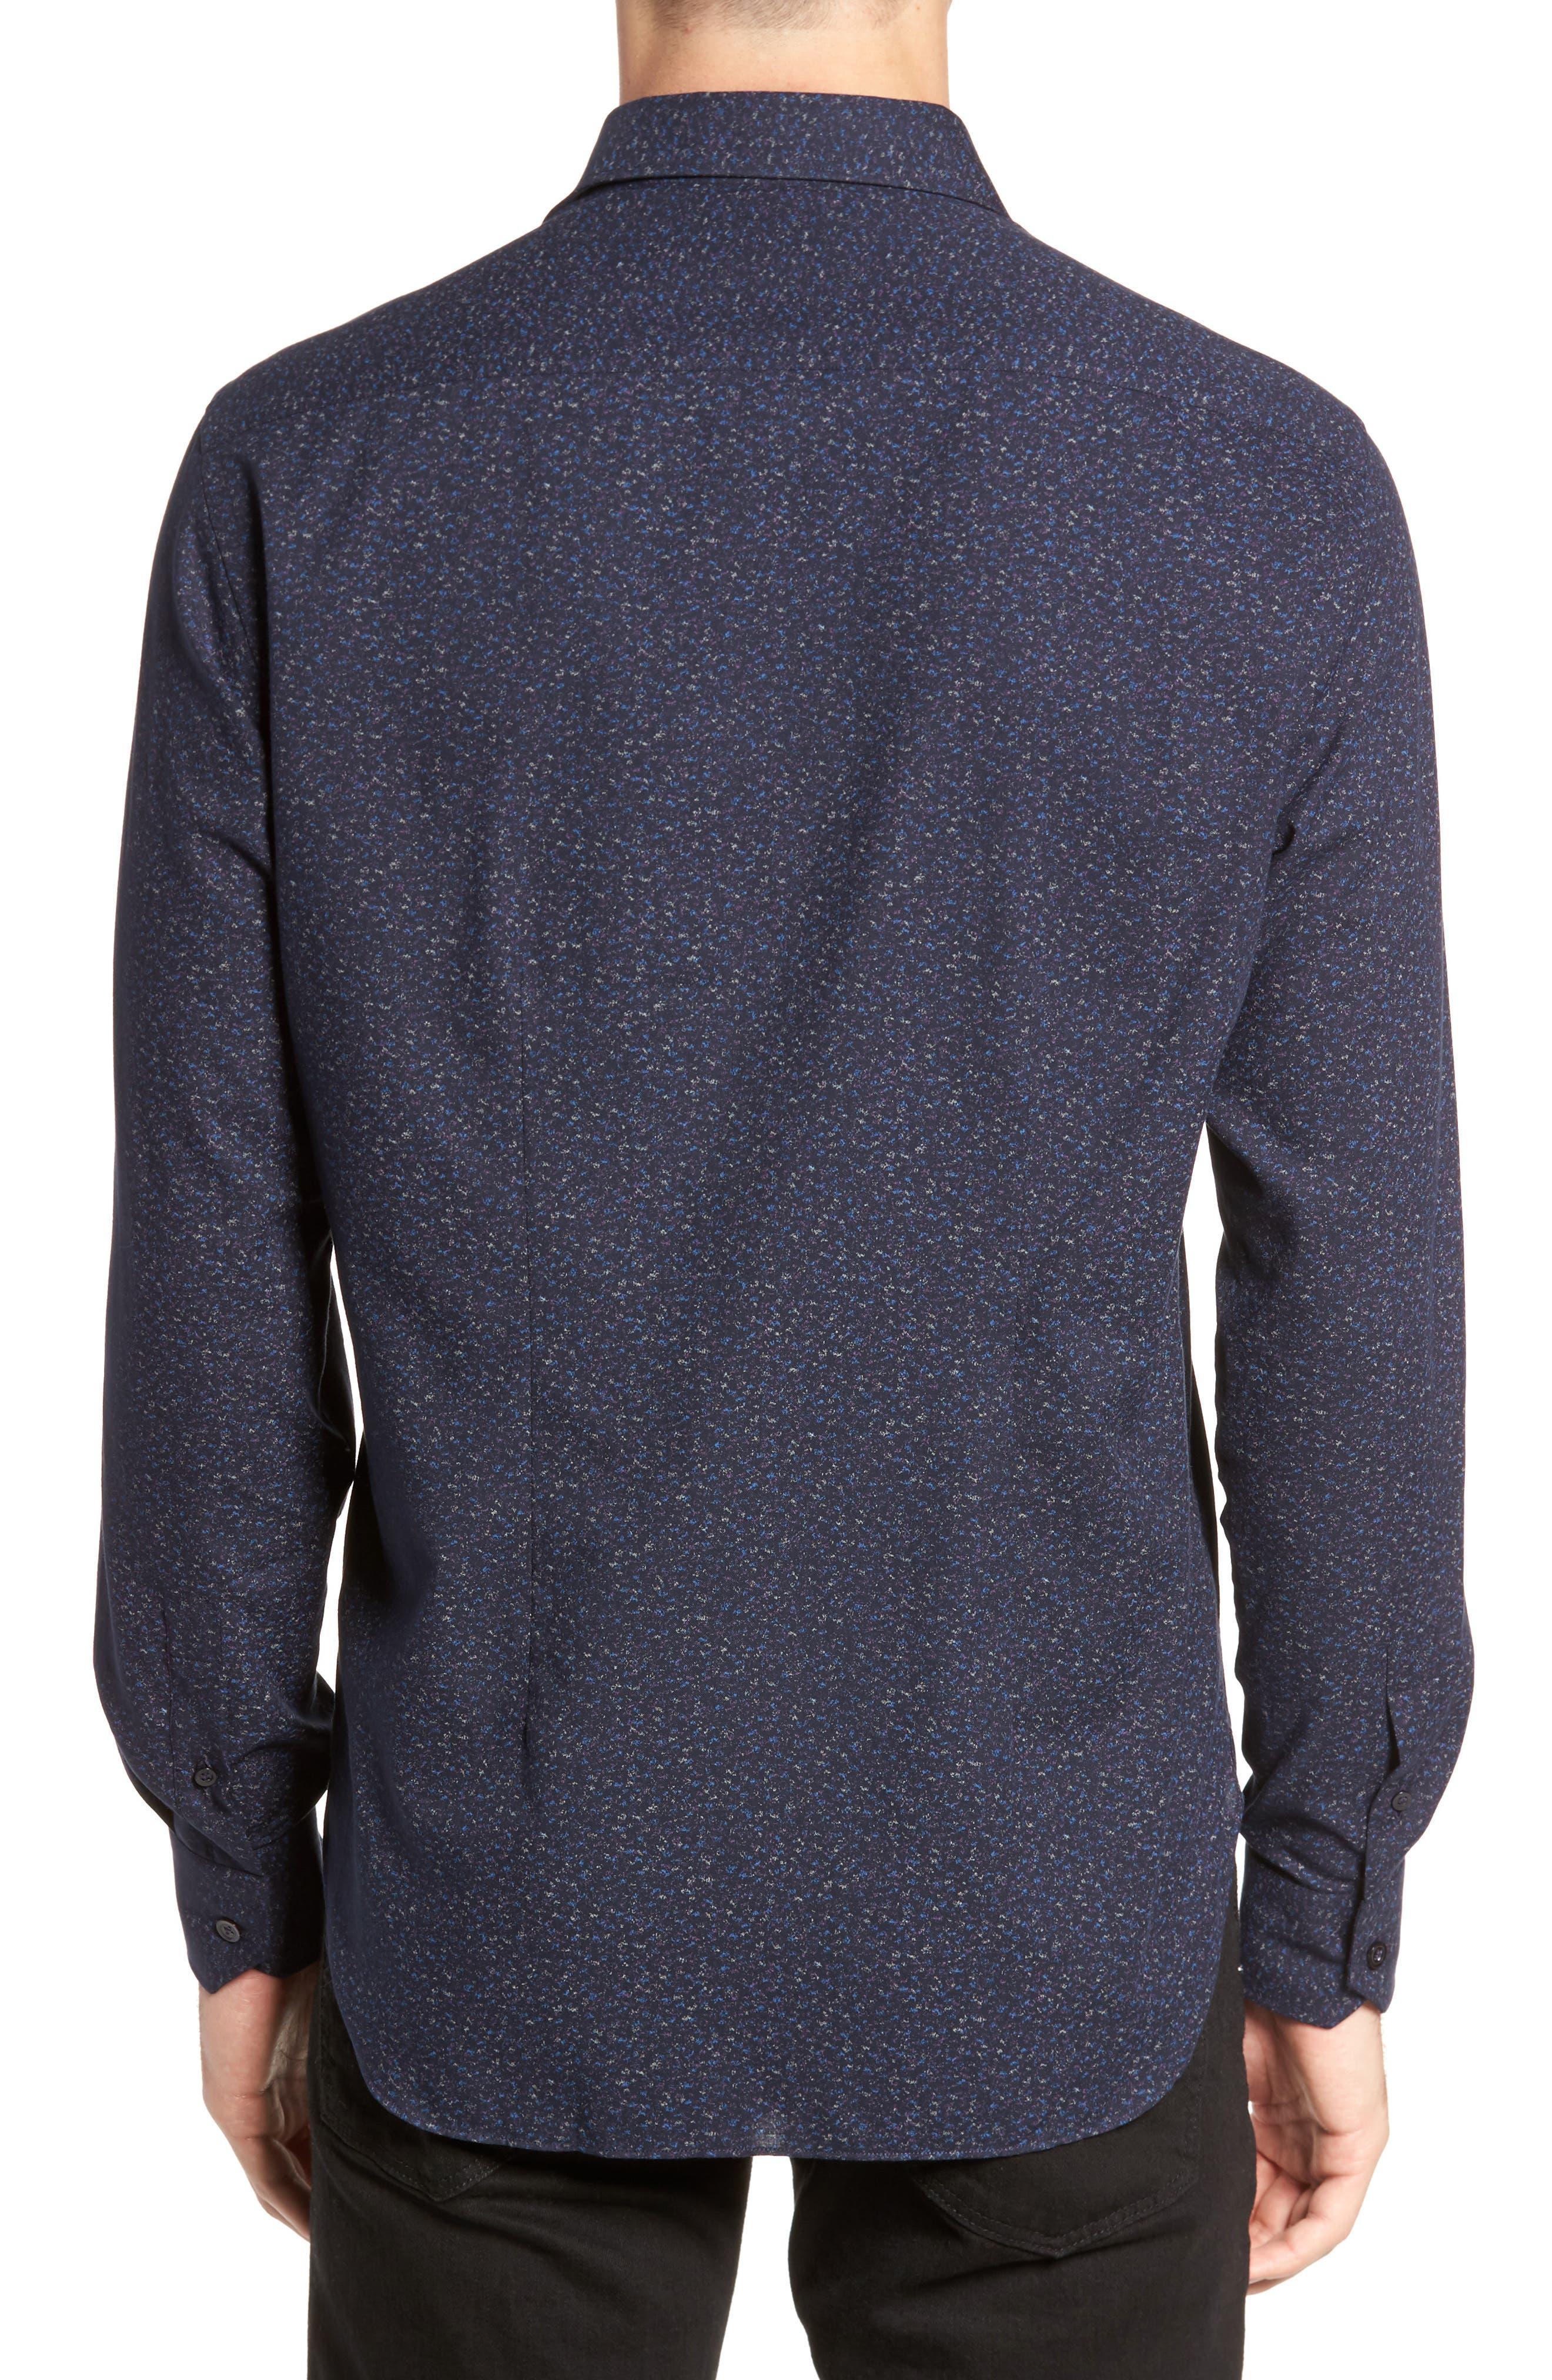 Speckled Sport Shirt,                             Alternate thumbnail 2, color,                             Navy